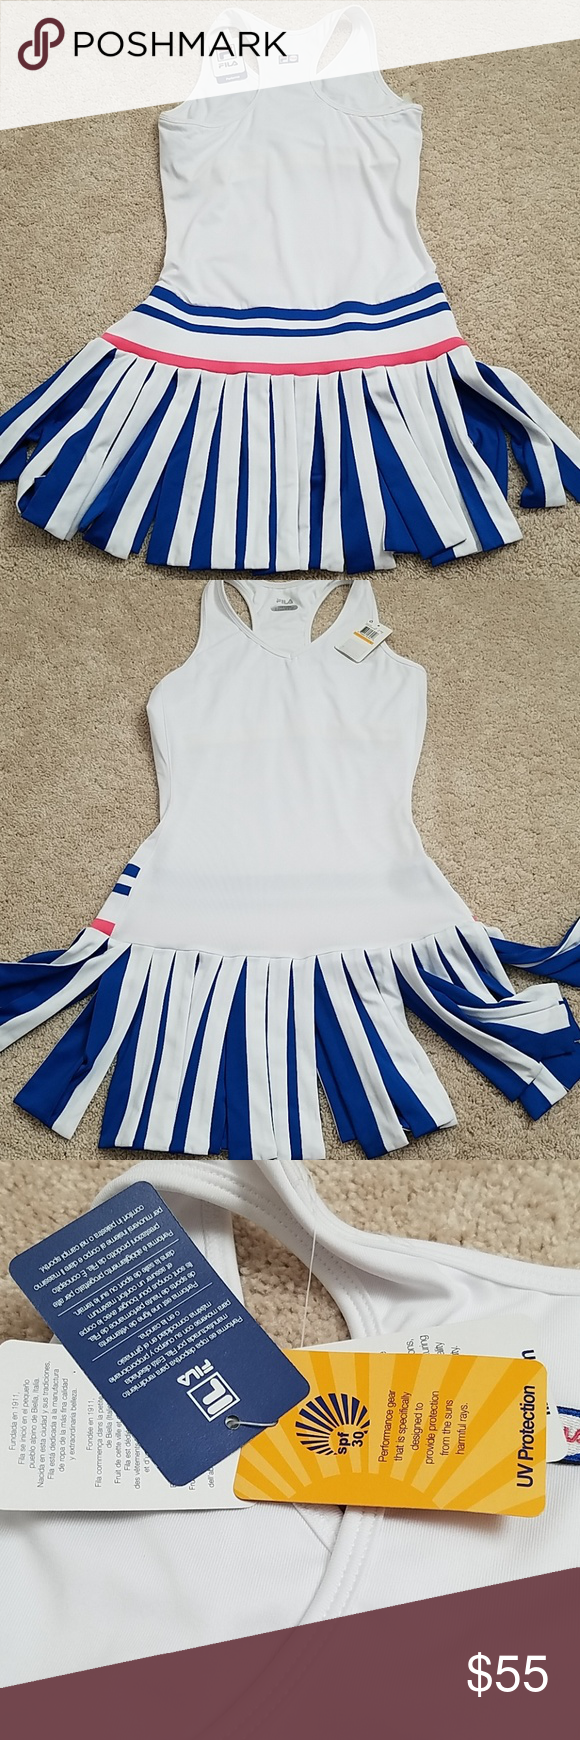 47bad87e9d2 Fila Heritage tennis dress Rare Fila Heritage tennis dress